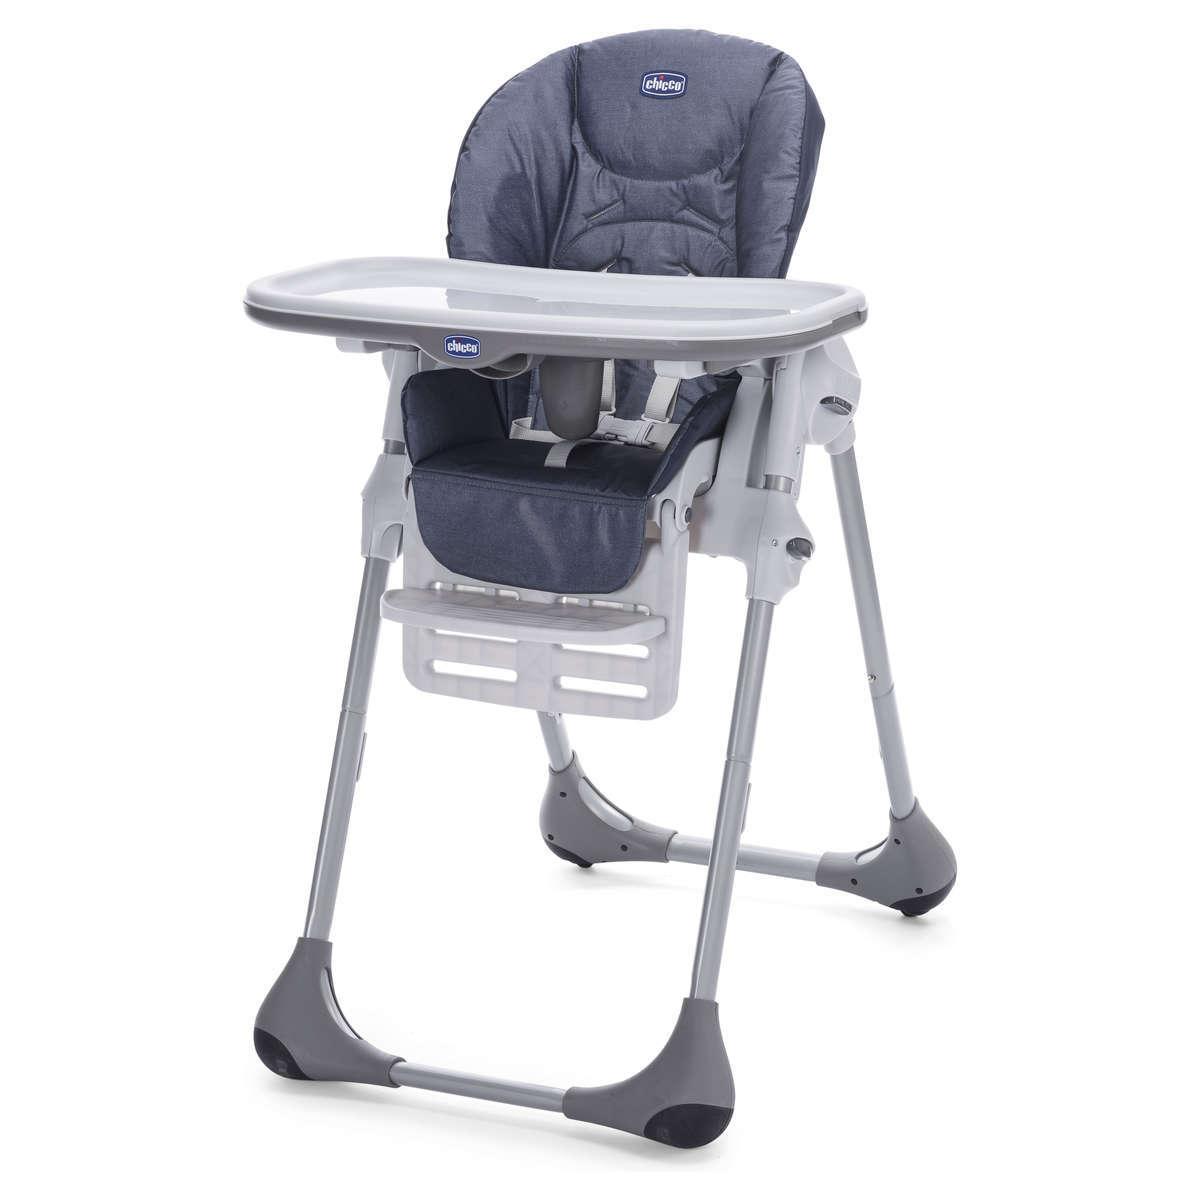 chicco chaise haute polly easy denim chaise haute chicco sur l 39 armoire de b b. Black Bedroom Furniture Sets. Home Design Ideas